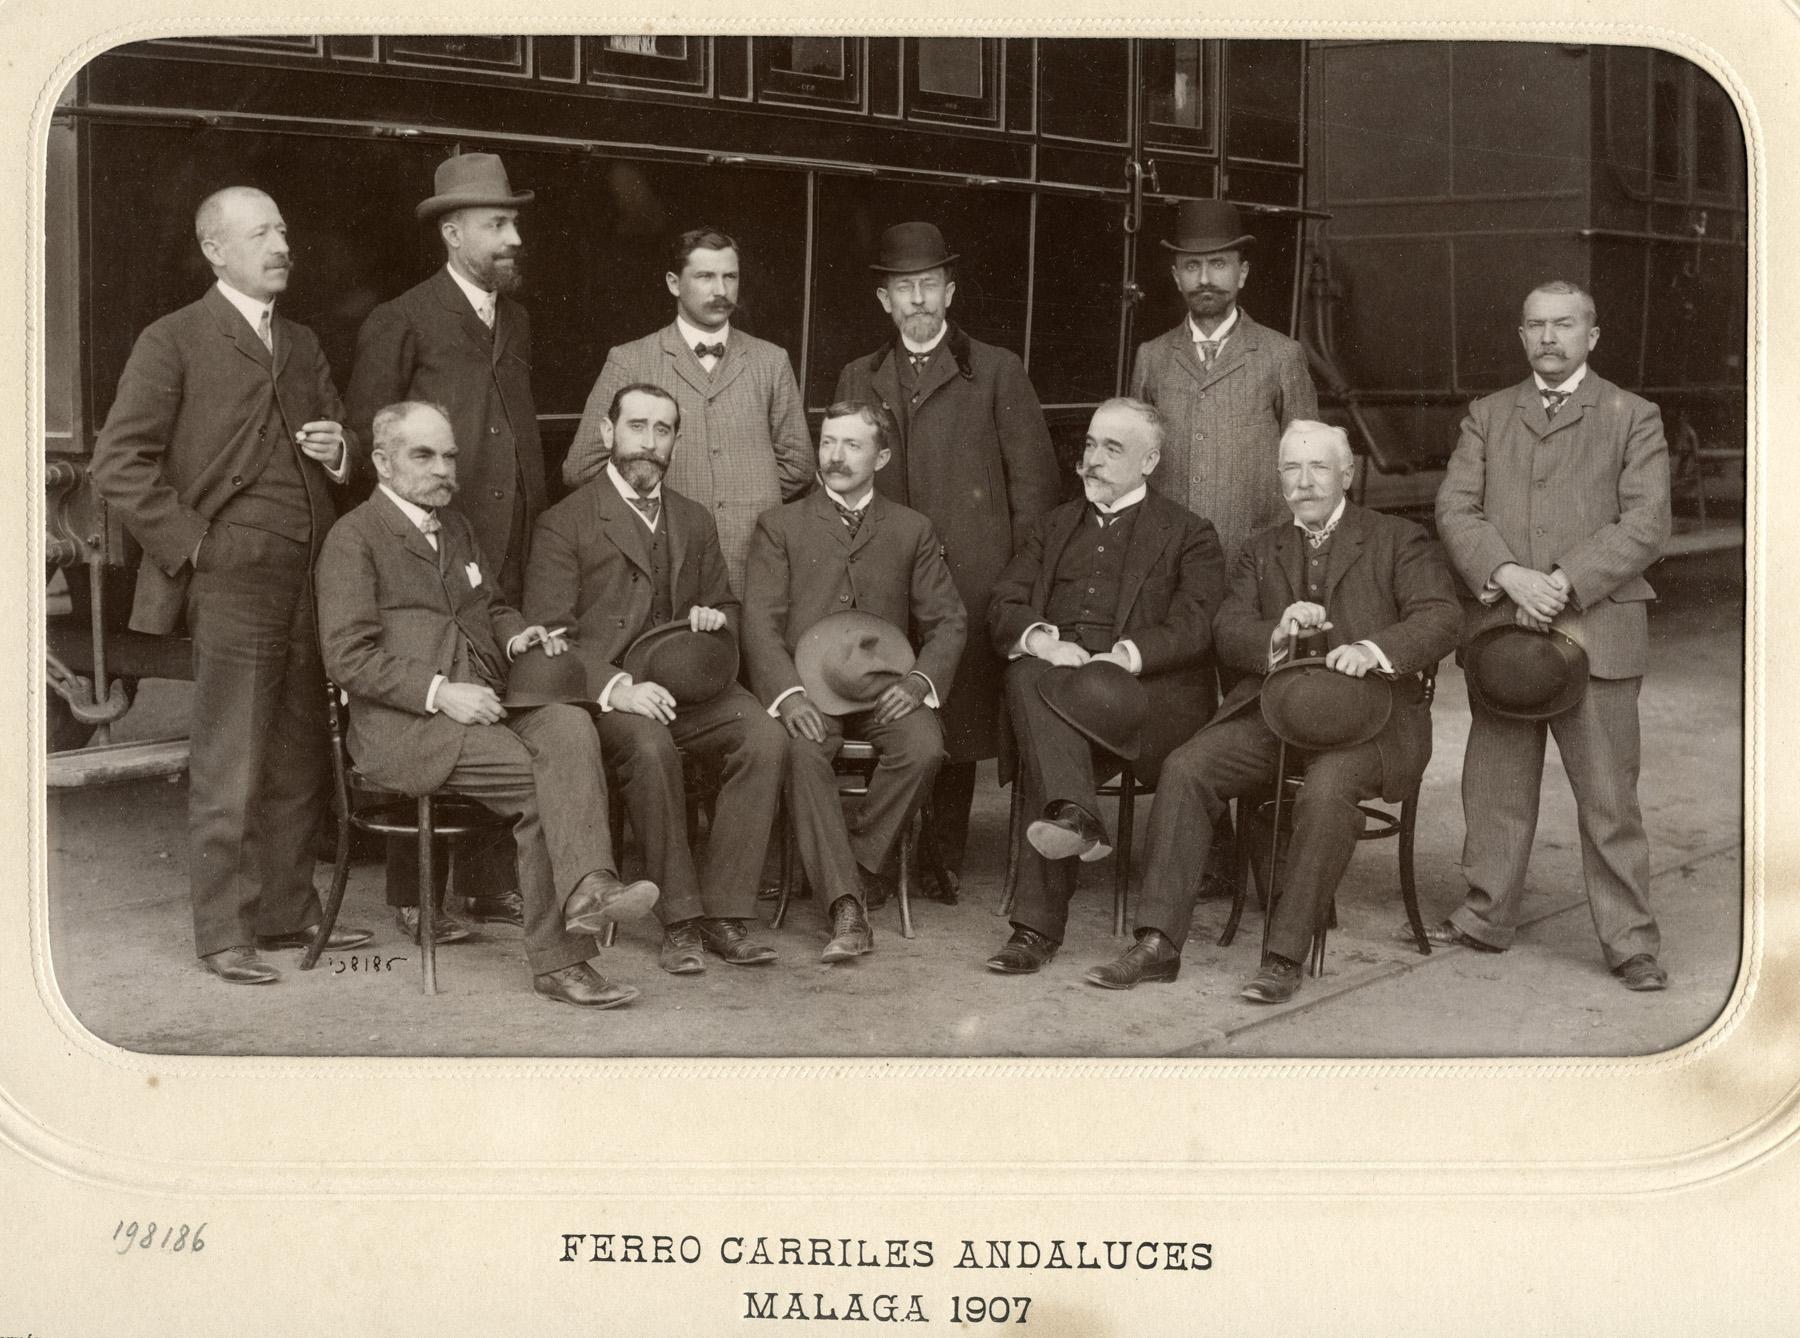 Málaga, directivos de Ferrocarriles Andaluces. De pie, segundo a la derecha de la imagen, Emile Rennes. Foto J. David, 1907.